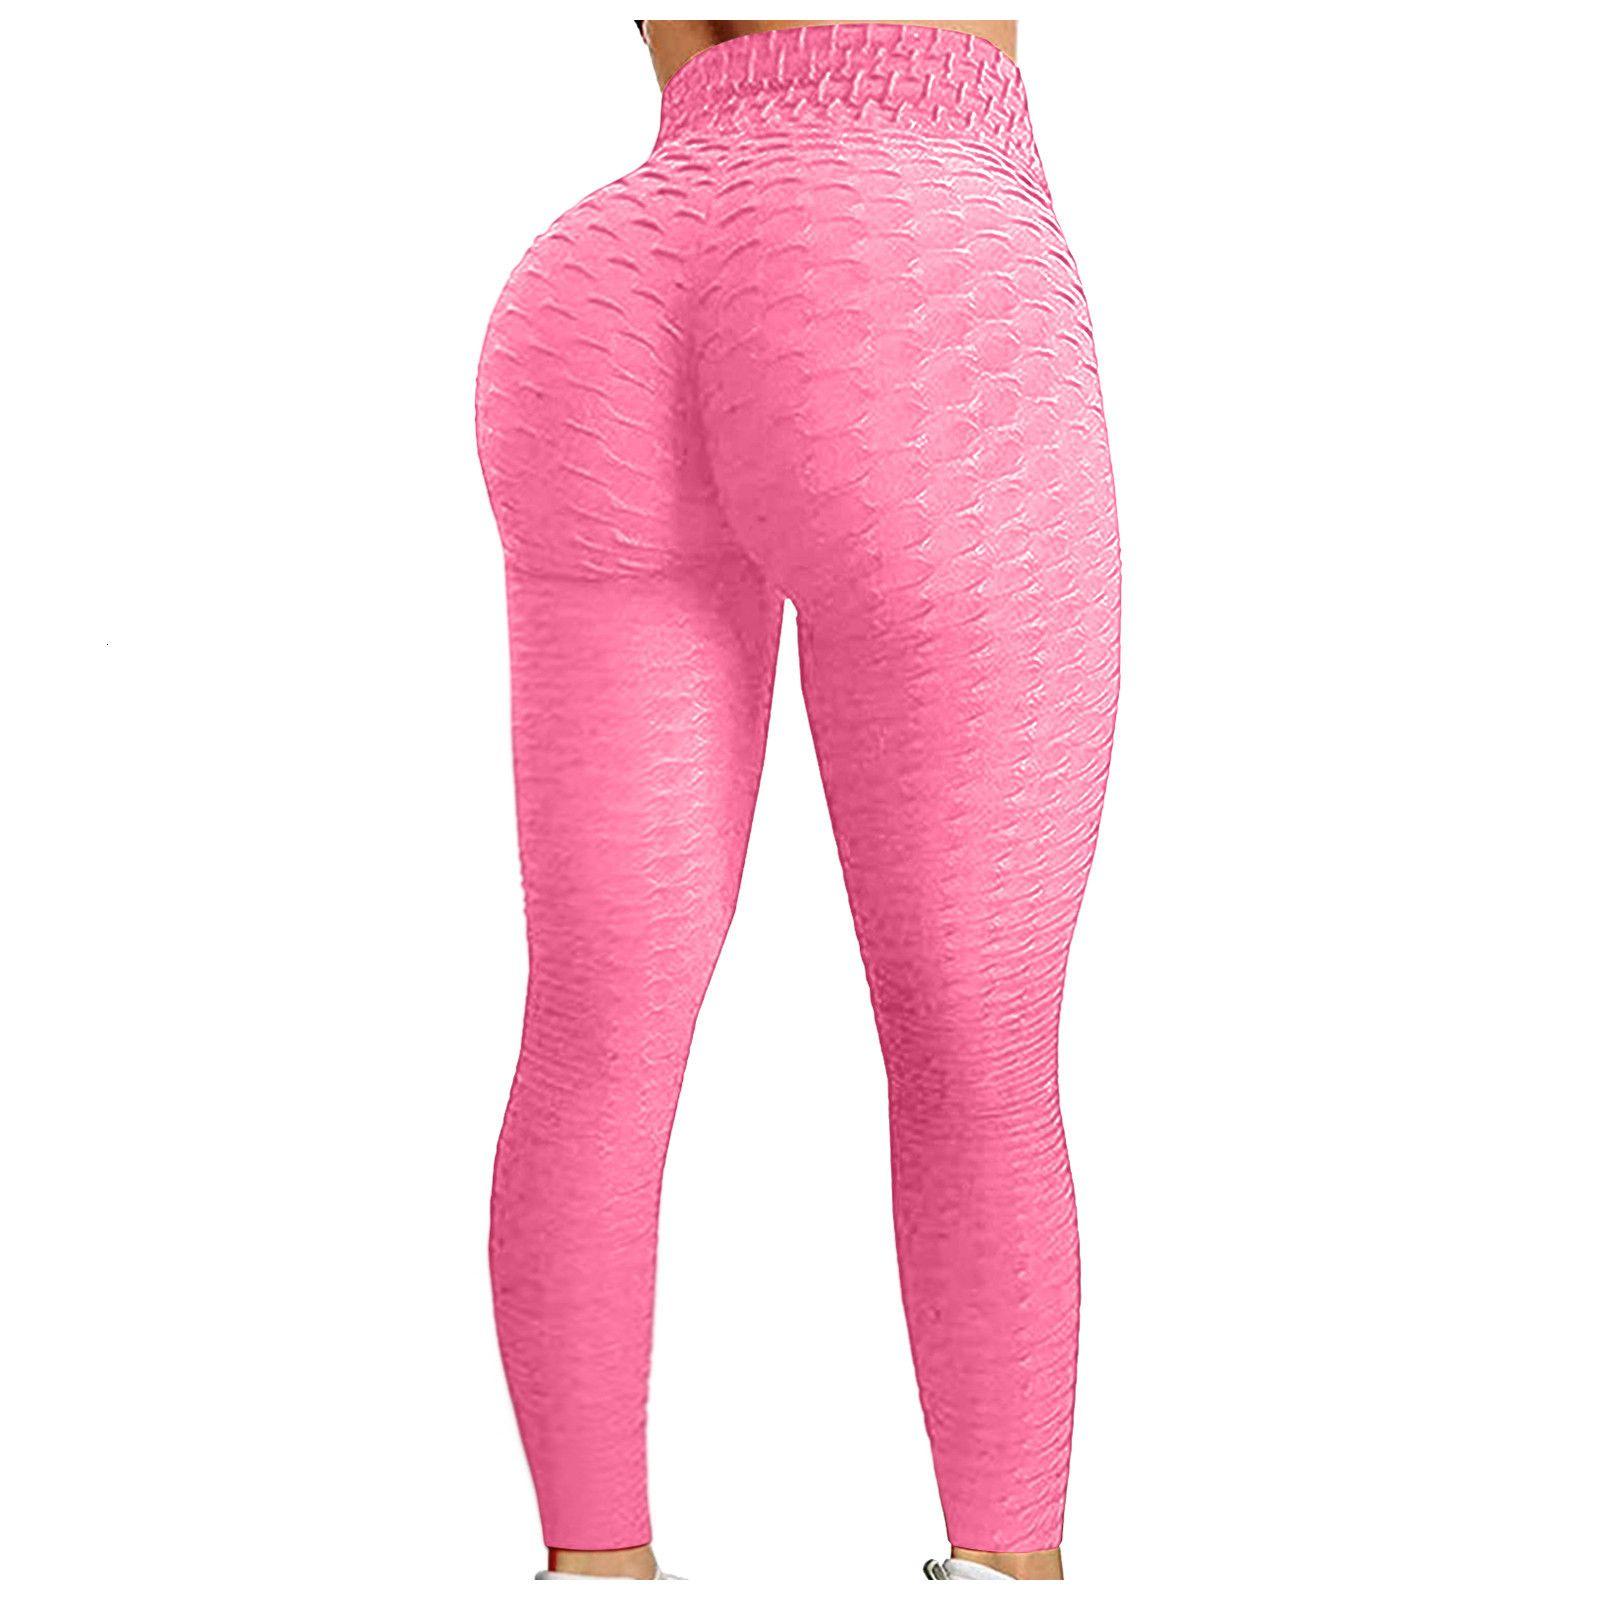 High Taille Mulheres Bubble Hip Lifting Exercício Fitness Running Jeggings Ginásio Feminino Desporto Desporto Leggings Broekhot Venda